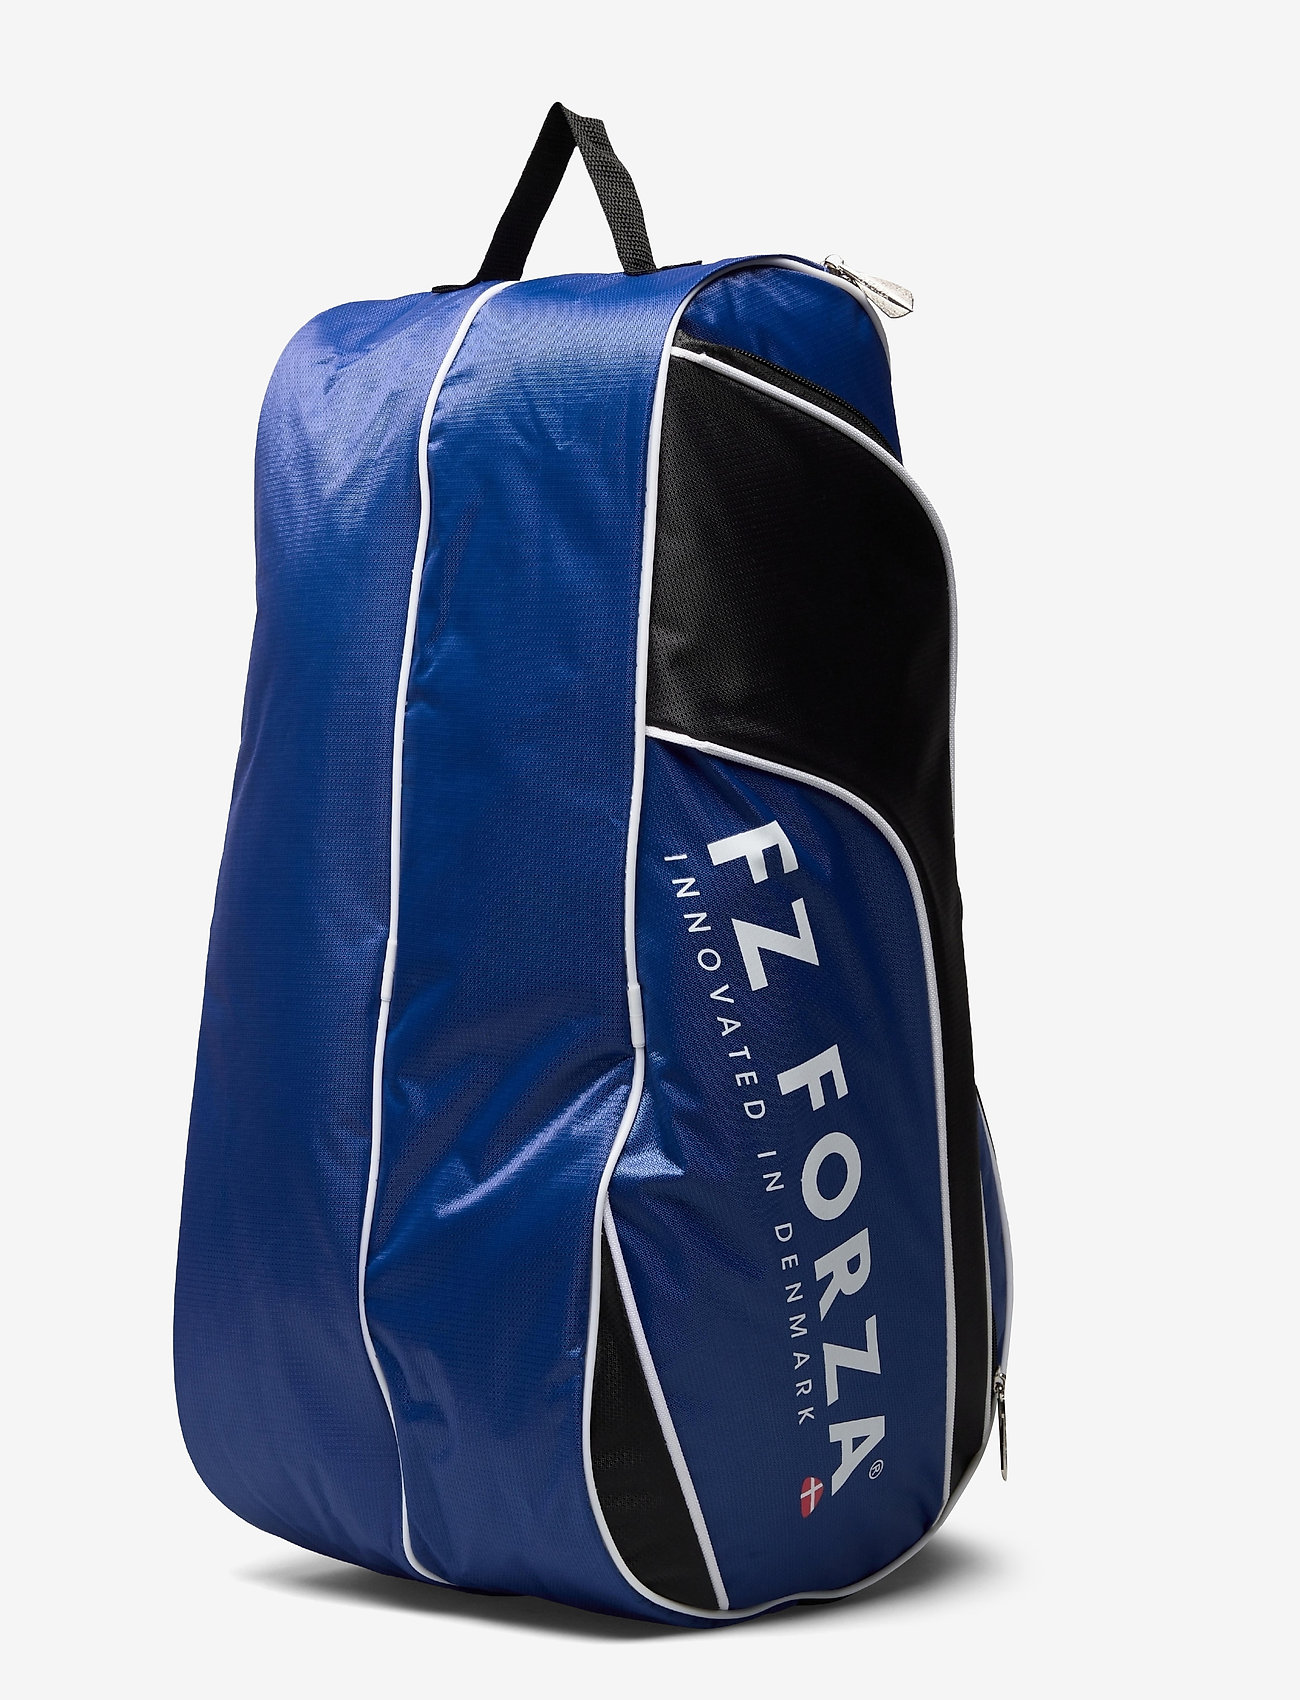 FZ Forza - FZ FORZA PADEL BAG SUPREME - ketsjersporttasker - 01109 olympian blue - 0